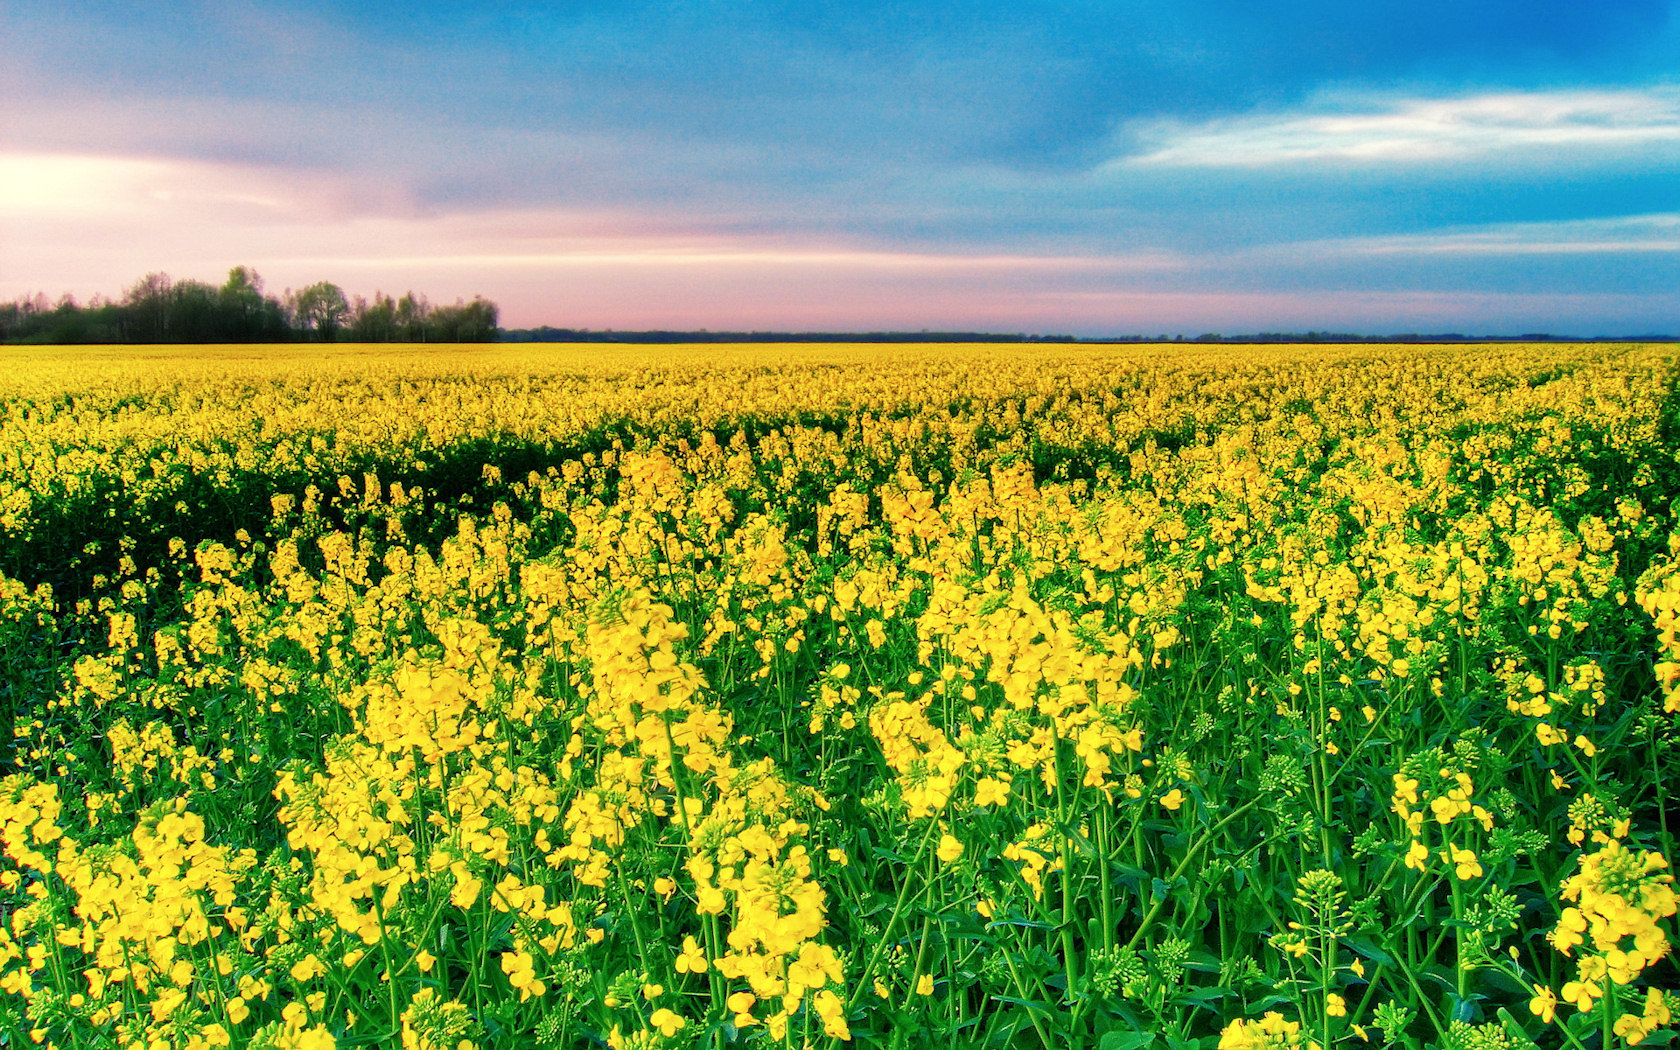 Imagini cu flori din natura camp cu flori Wallpapereorg 1680x1050